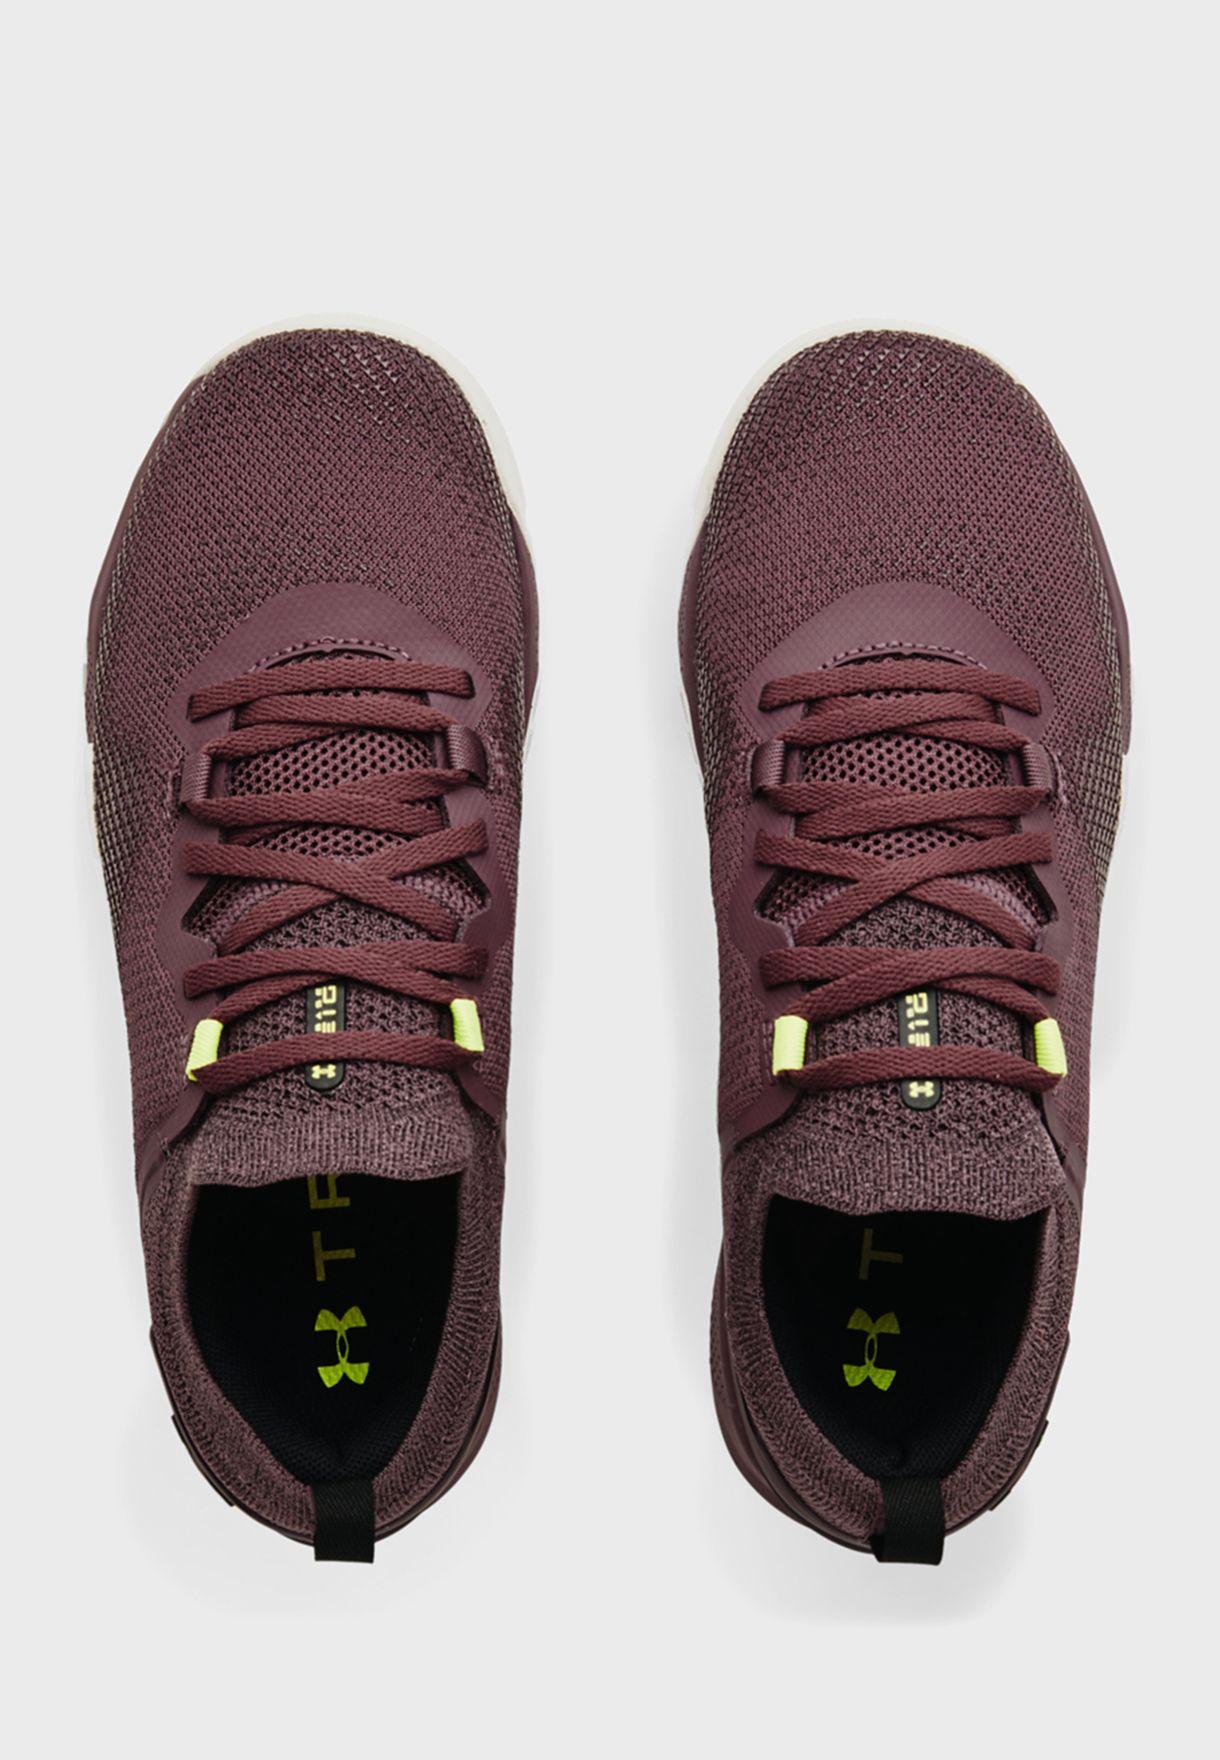 حذاء تراي بيس راين 3 ان ام